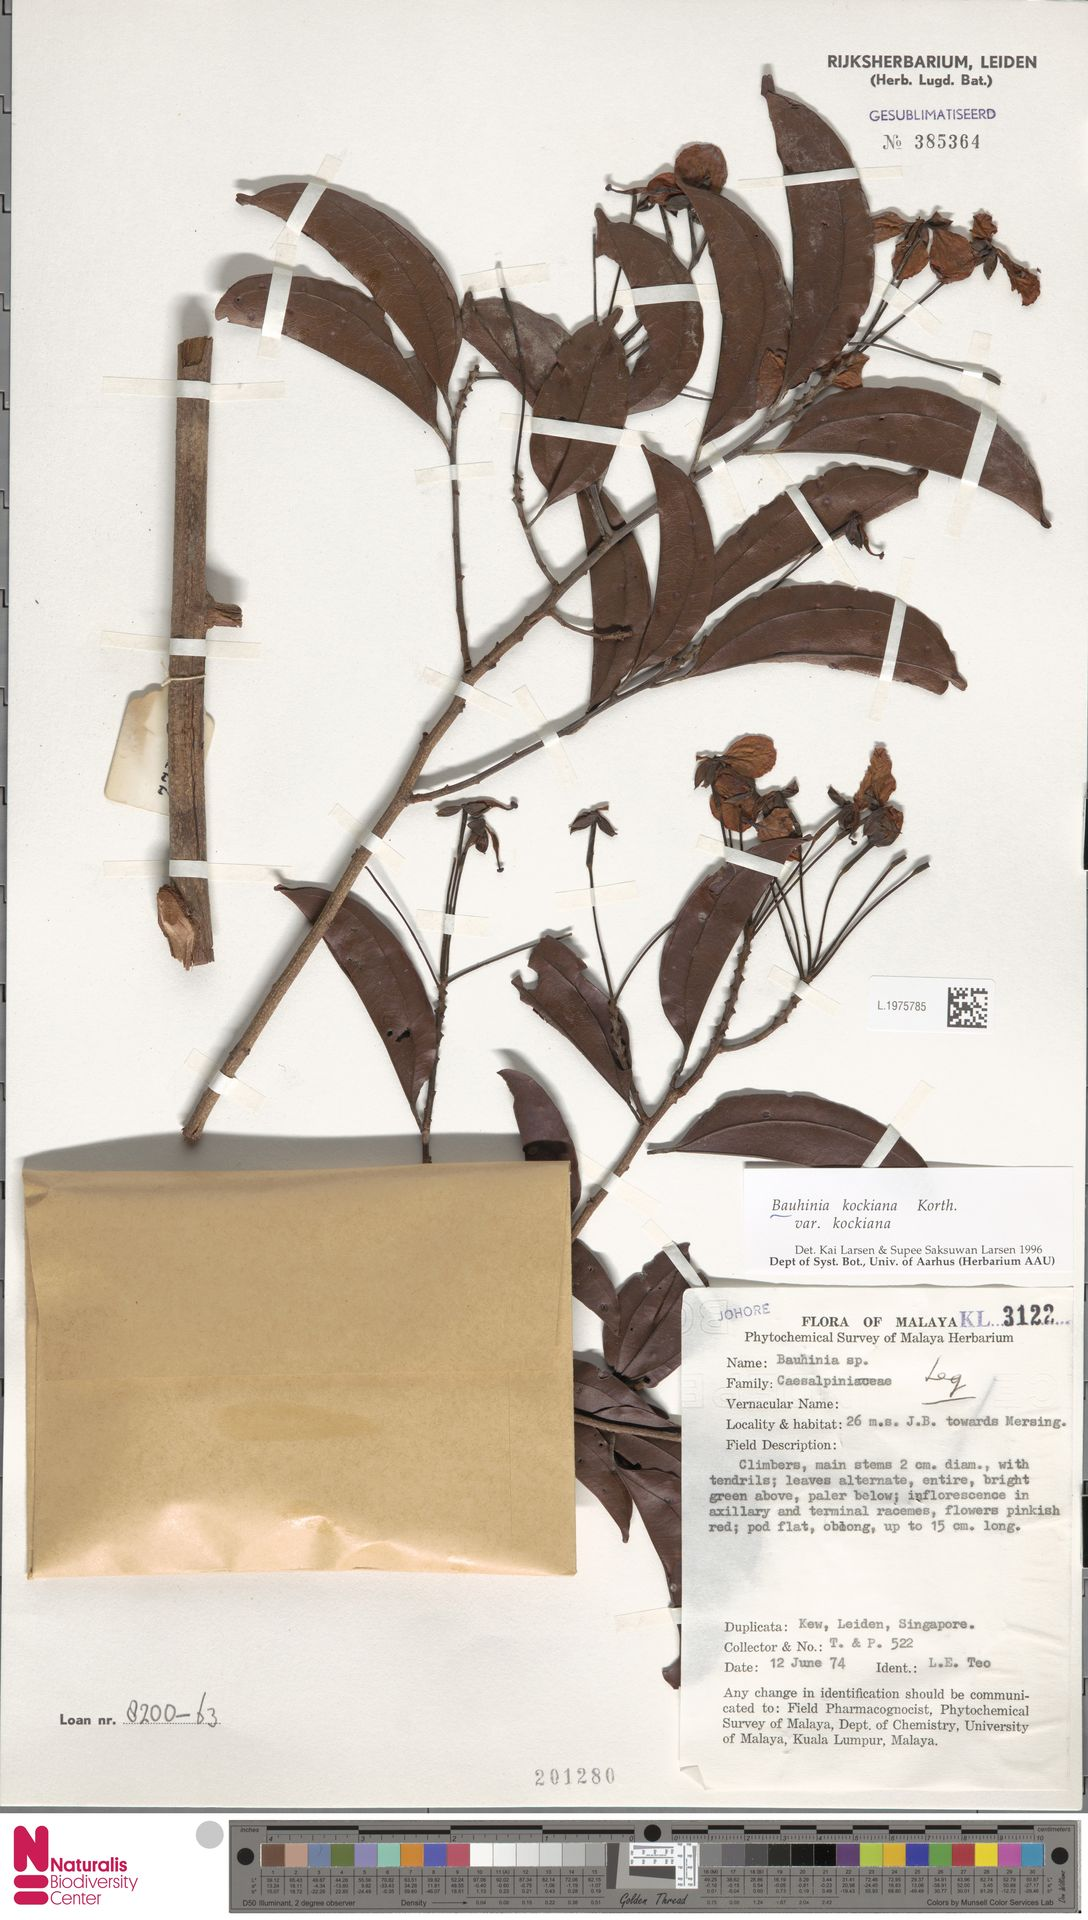 L.1975785 | Bauhinia kockiana var. kockiana